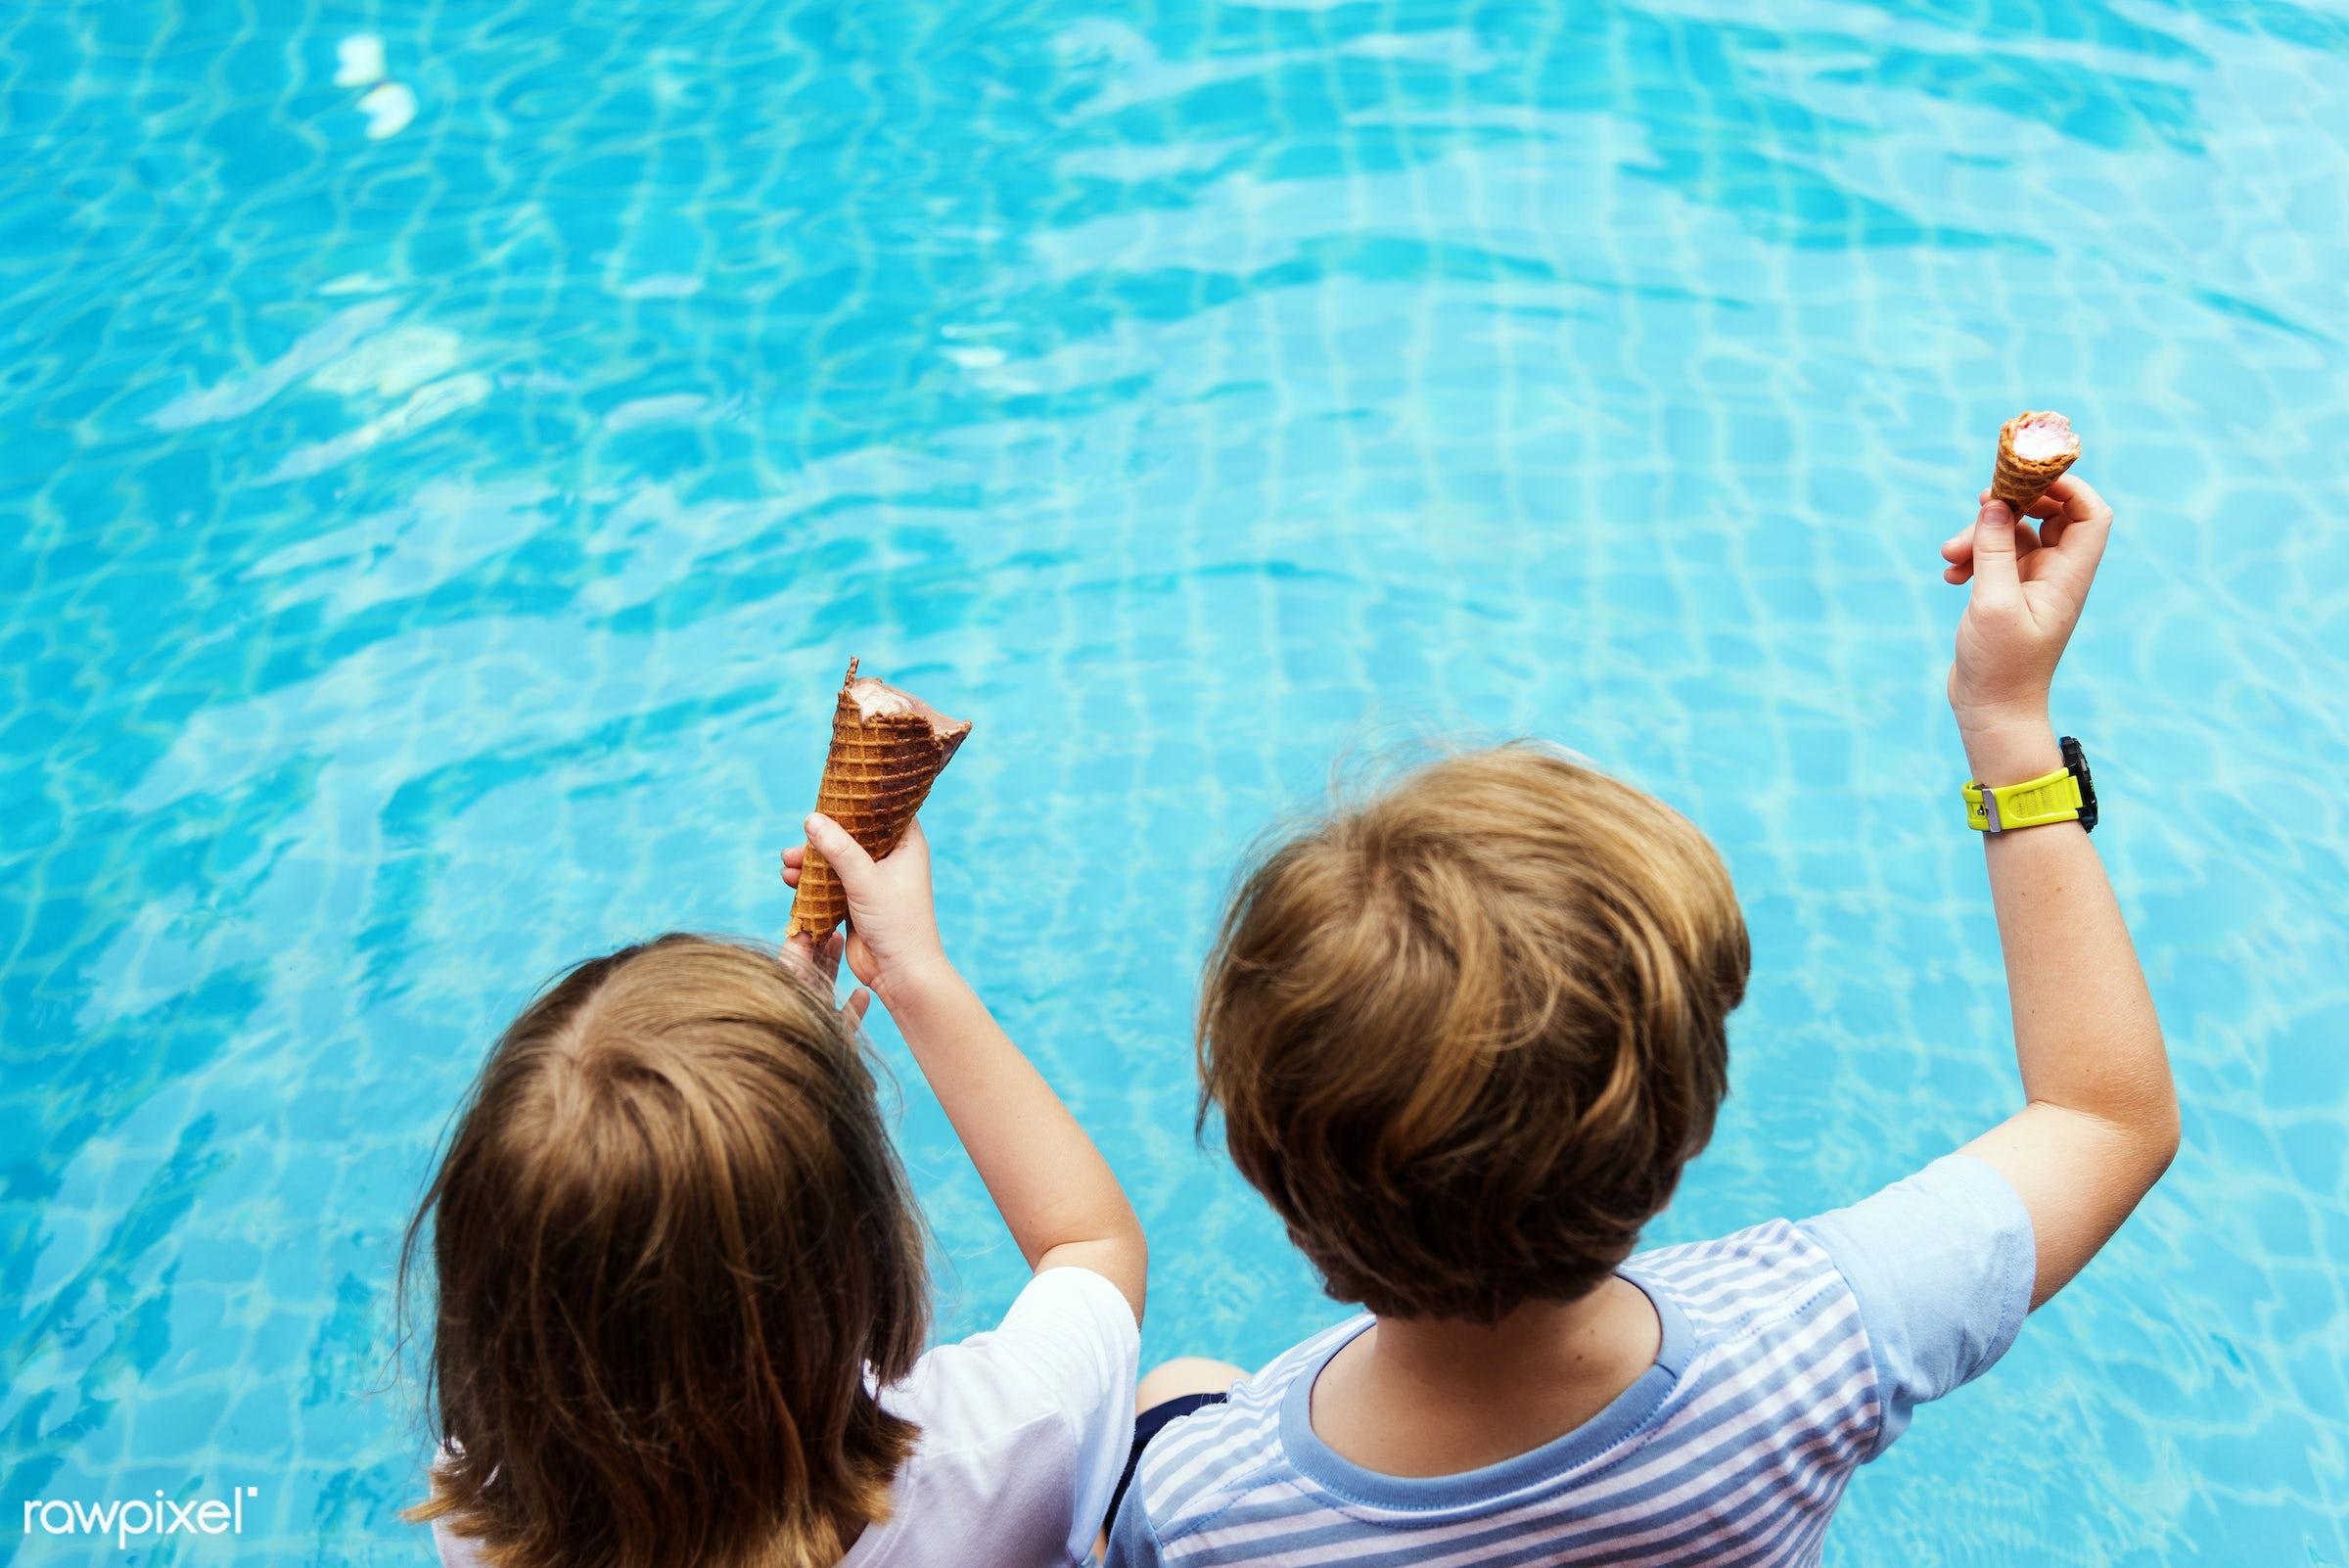 playful, joy, children, swimming pool, people, caucasian, kid, child, happy, lifestyle, casual, ice cream, childhood,...